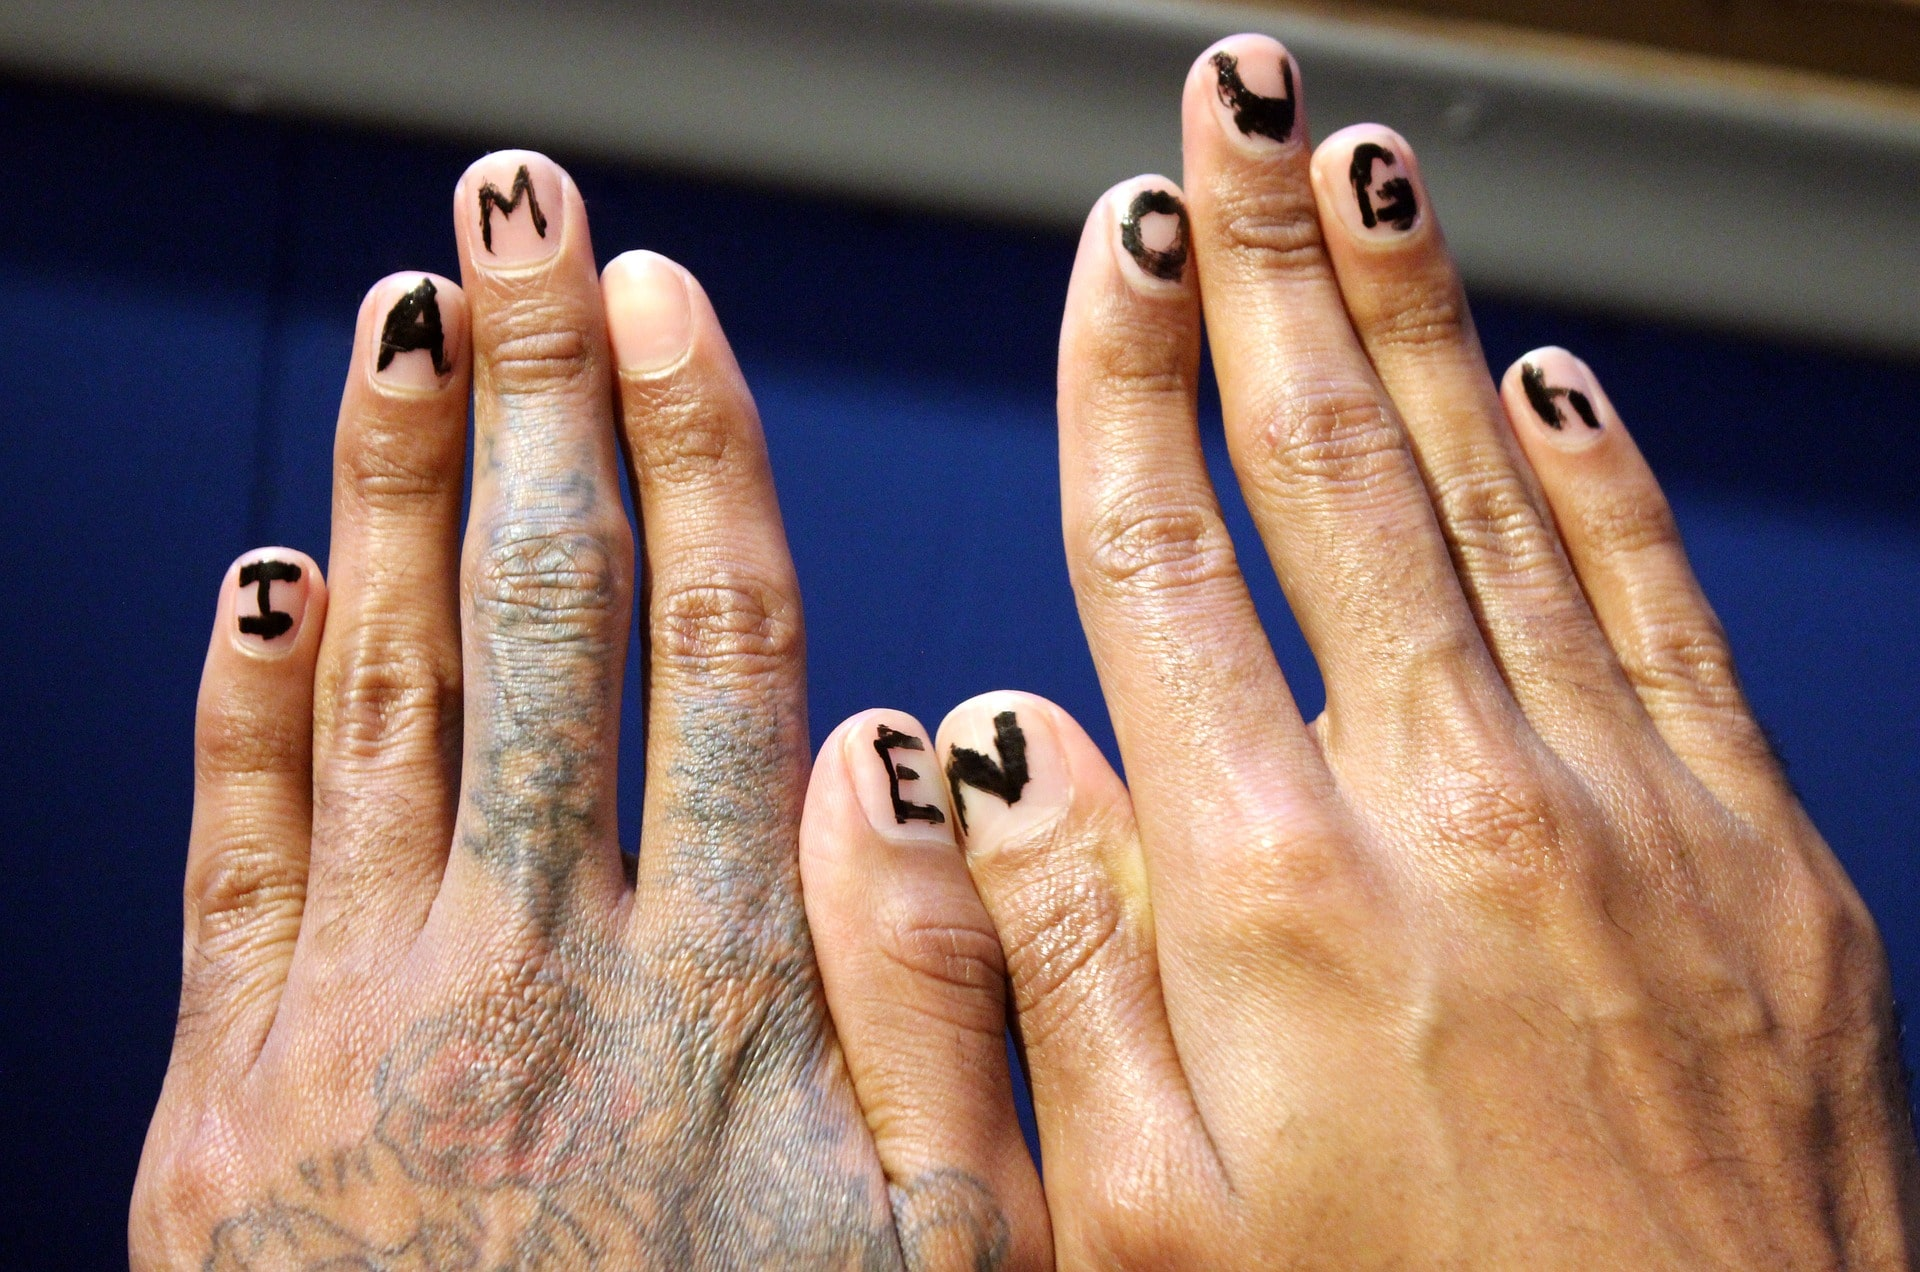 fingers spelling I Am Enough